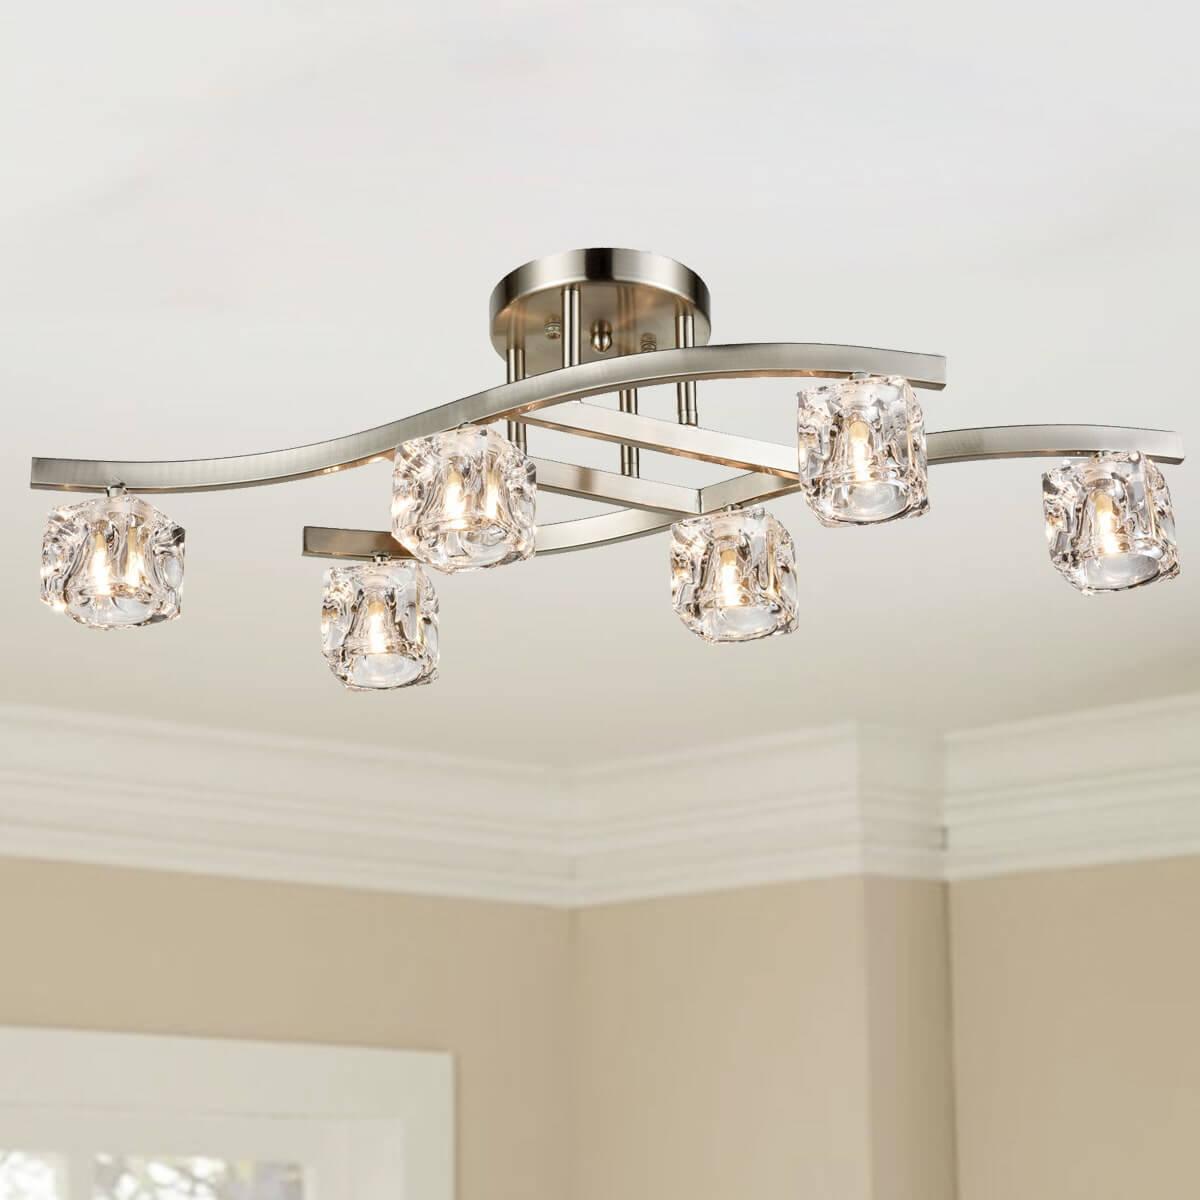 Modern Chrome Ceiling Light Fixture Glass Crystal Ice Cube 6-lights